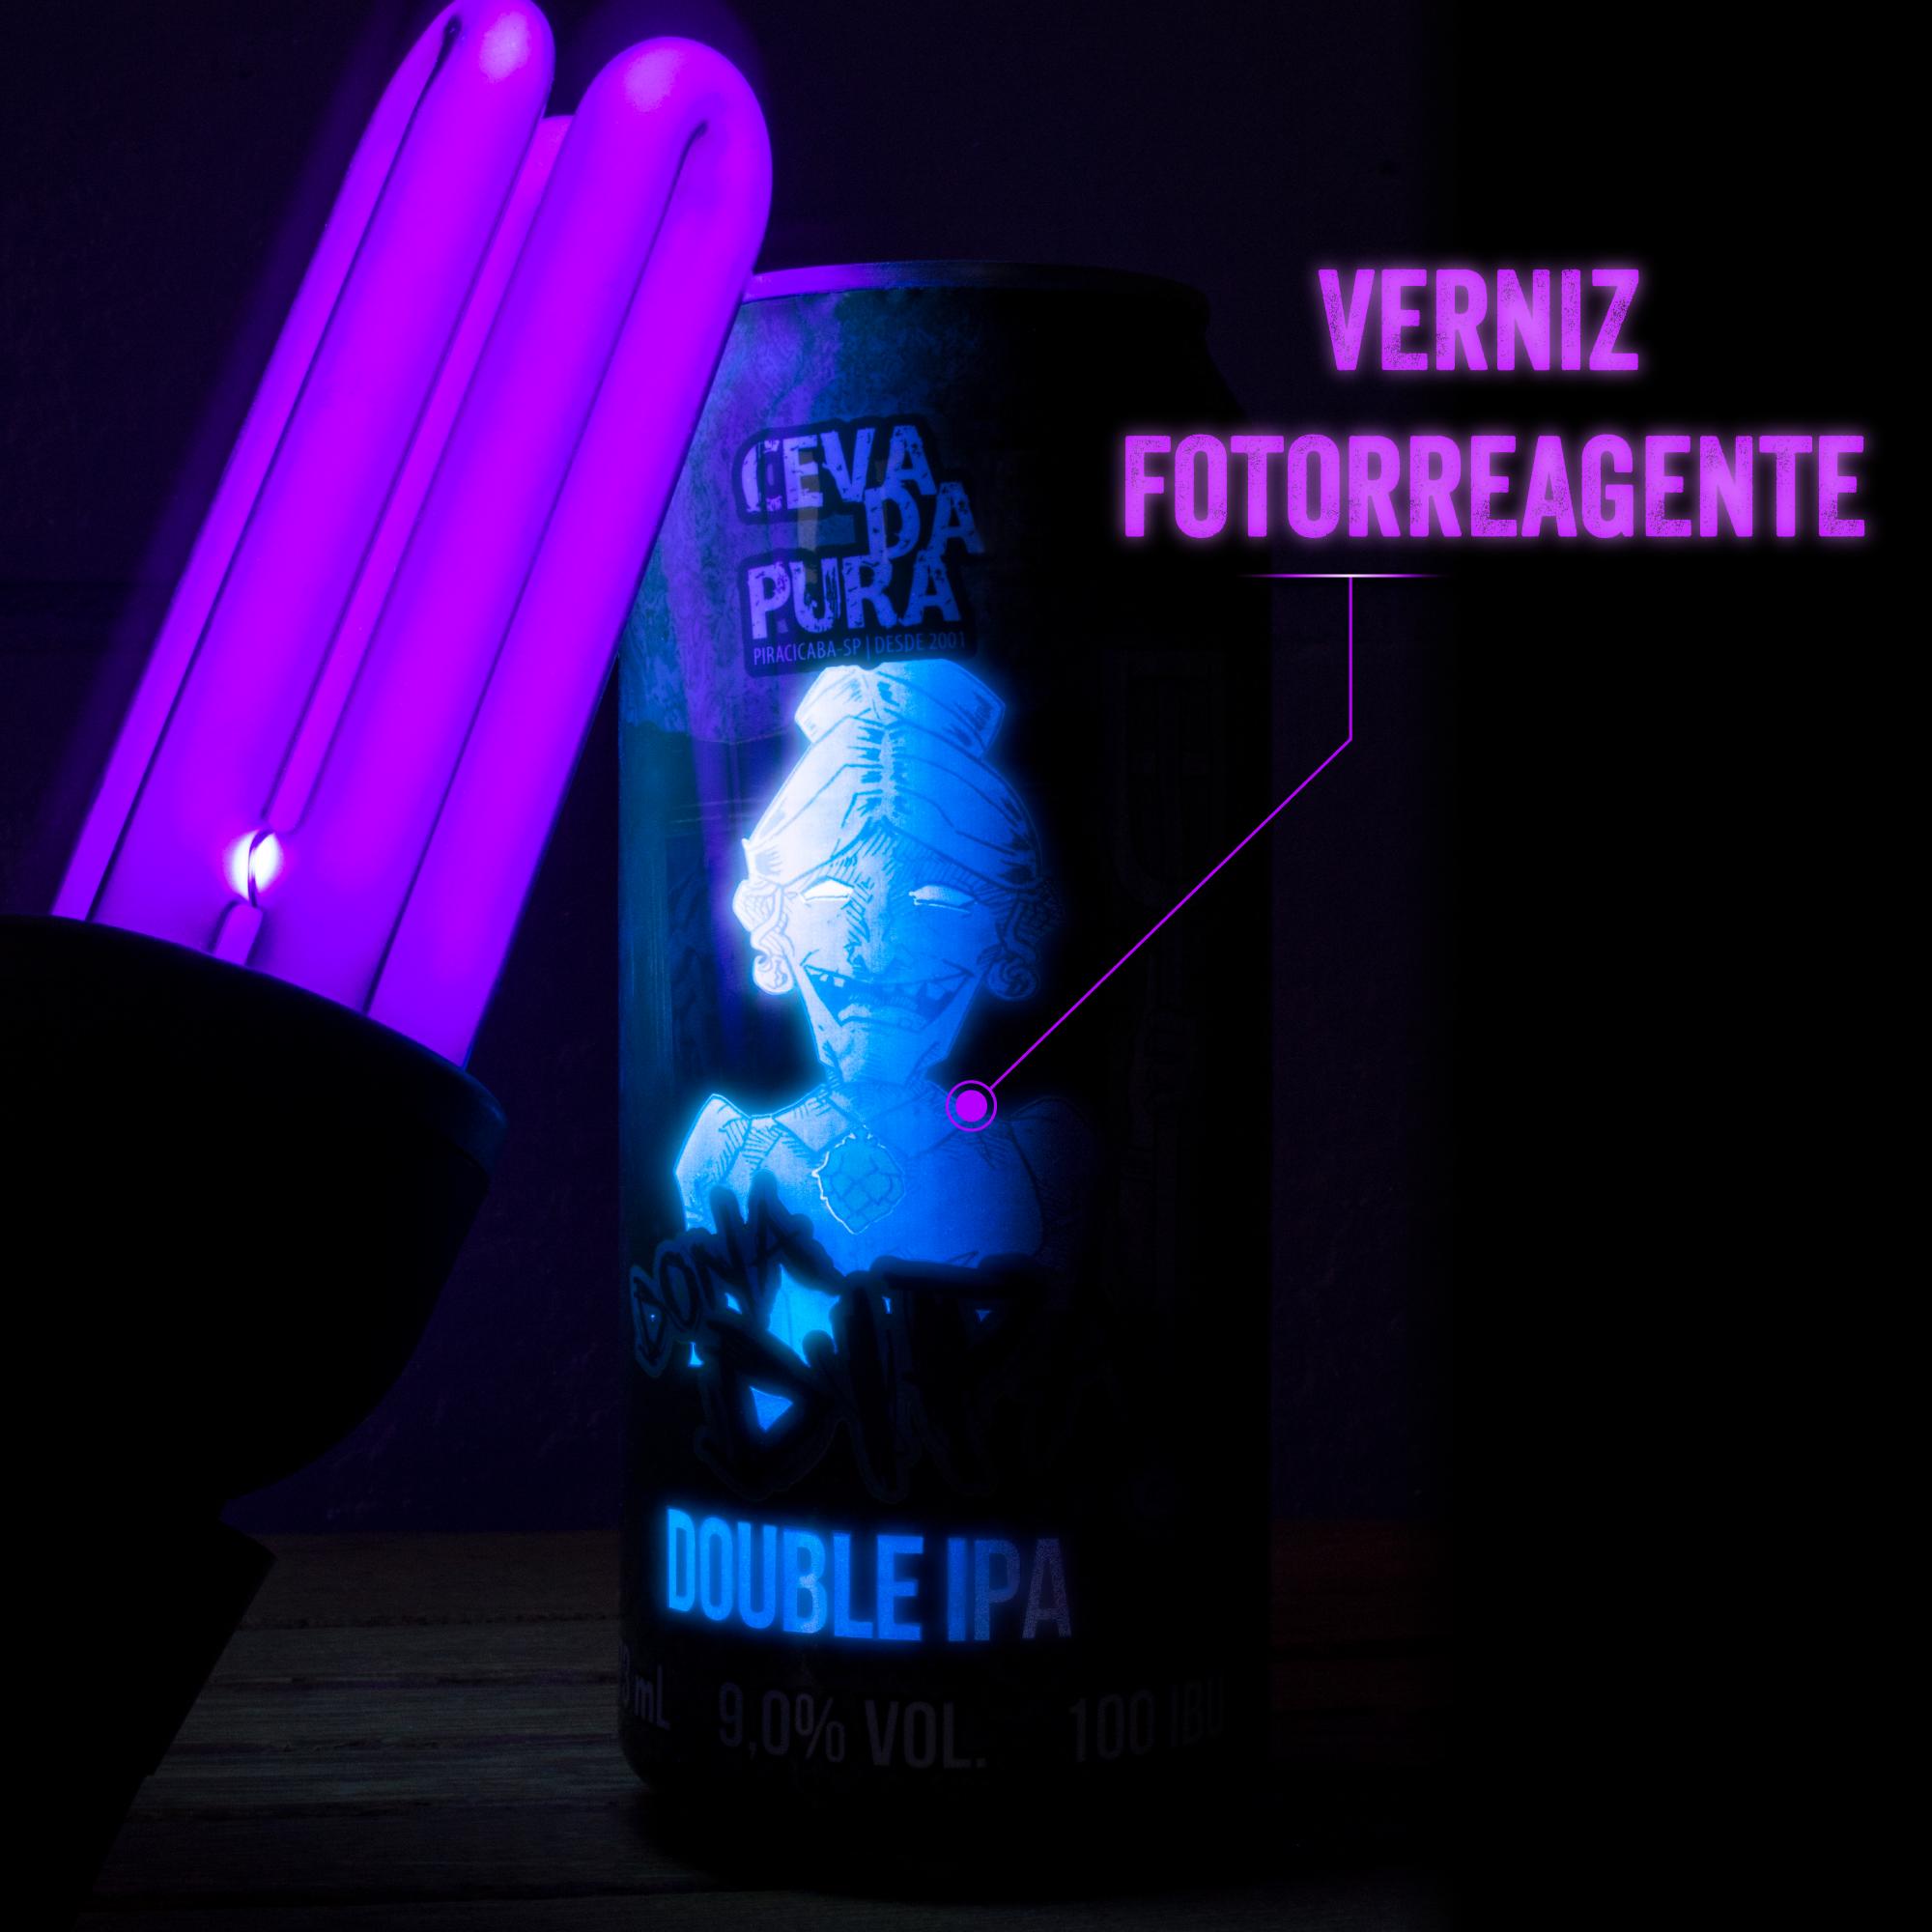 Rótulo Dona Dipa - Cevada Pura - Verniz Fotorreagente